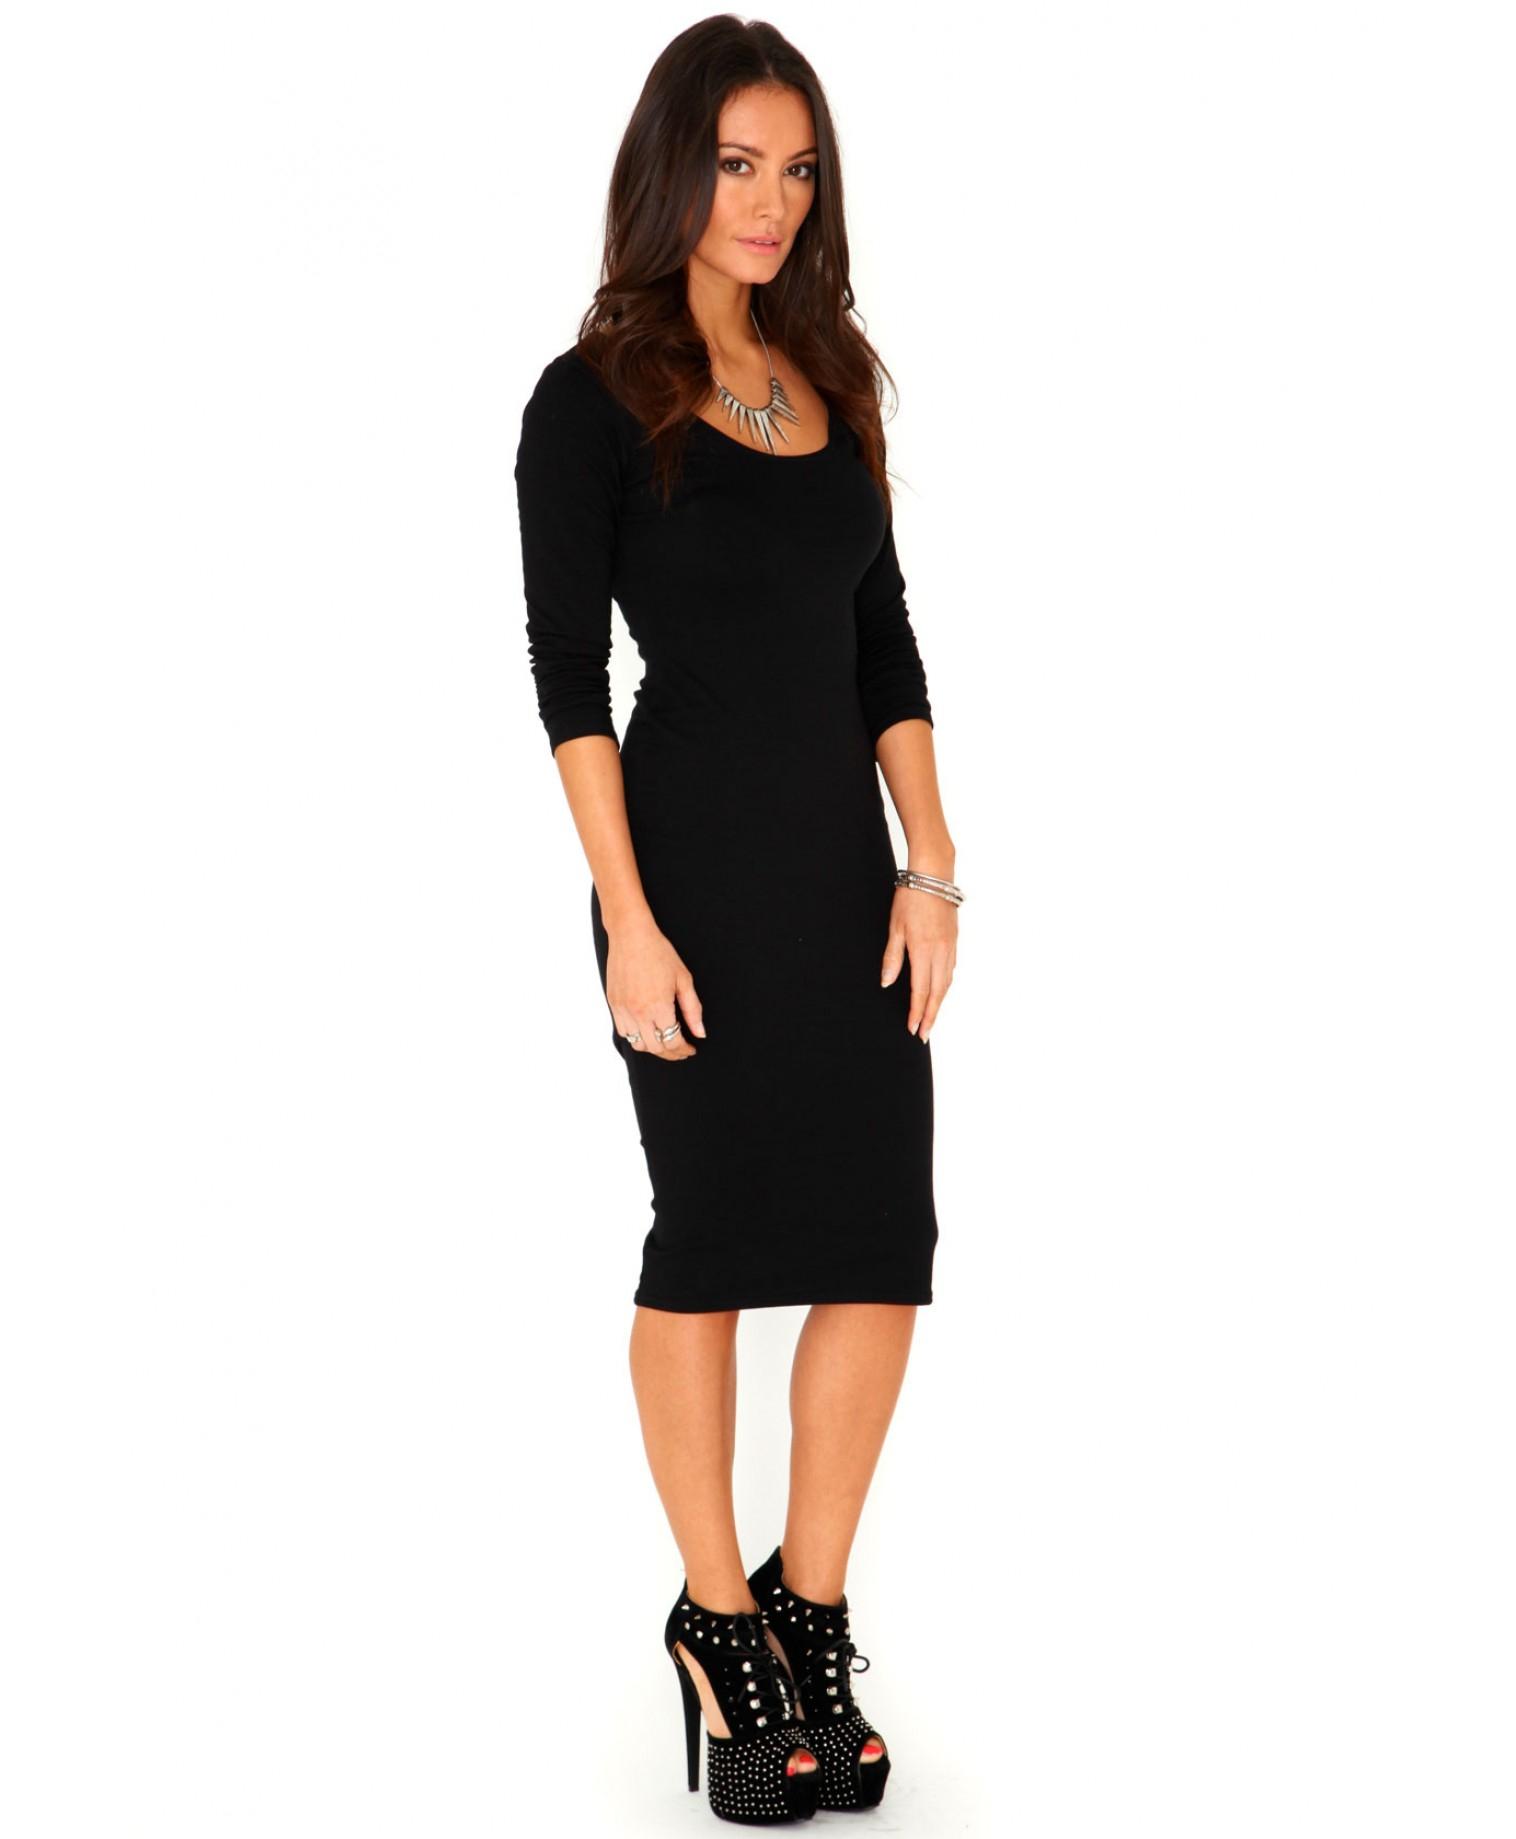 Black long sleeve scoop neck bodycon dress